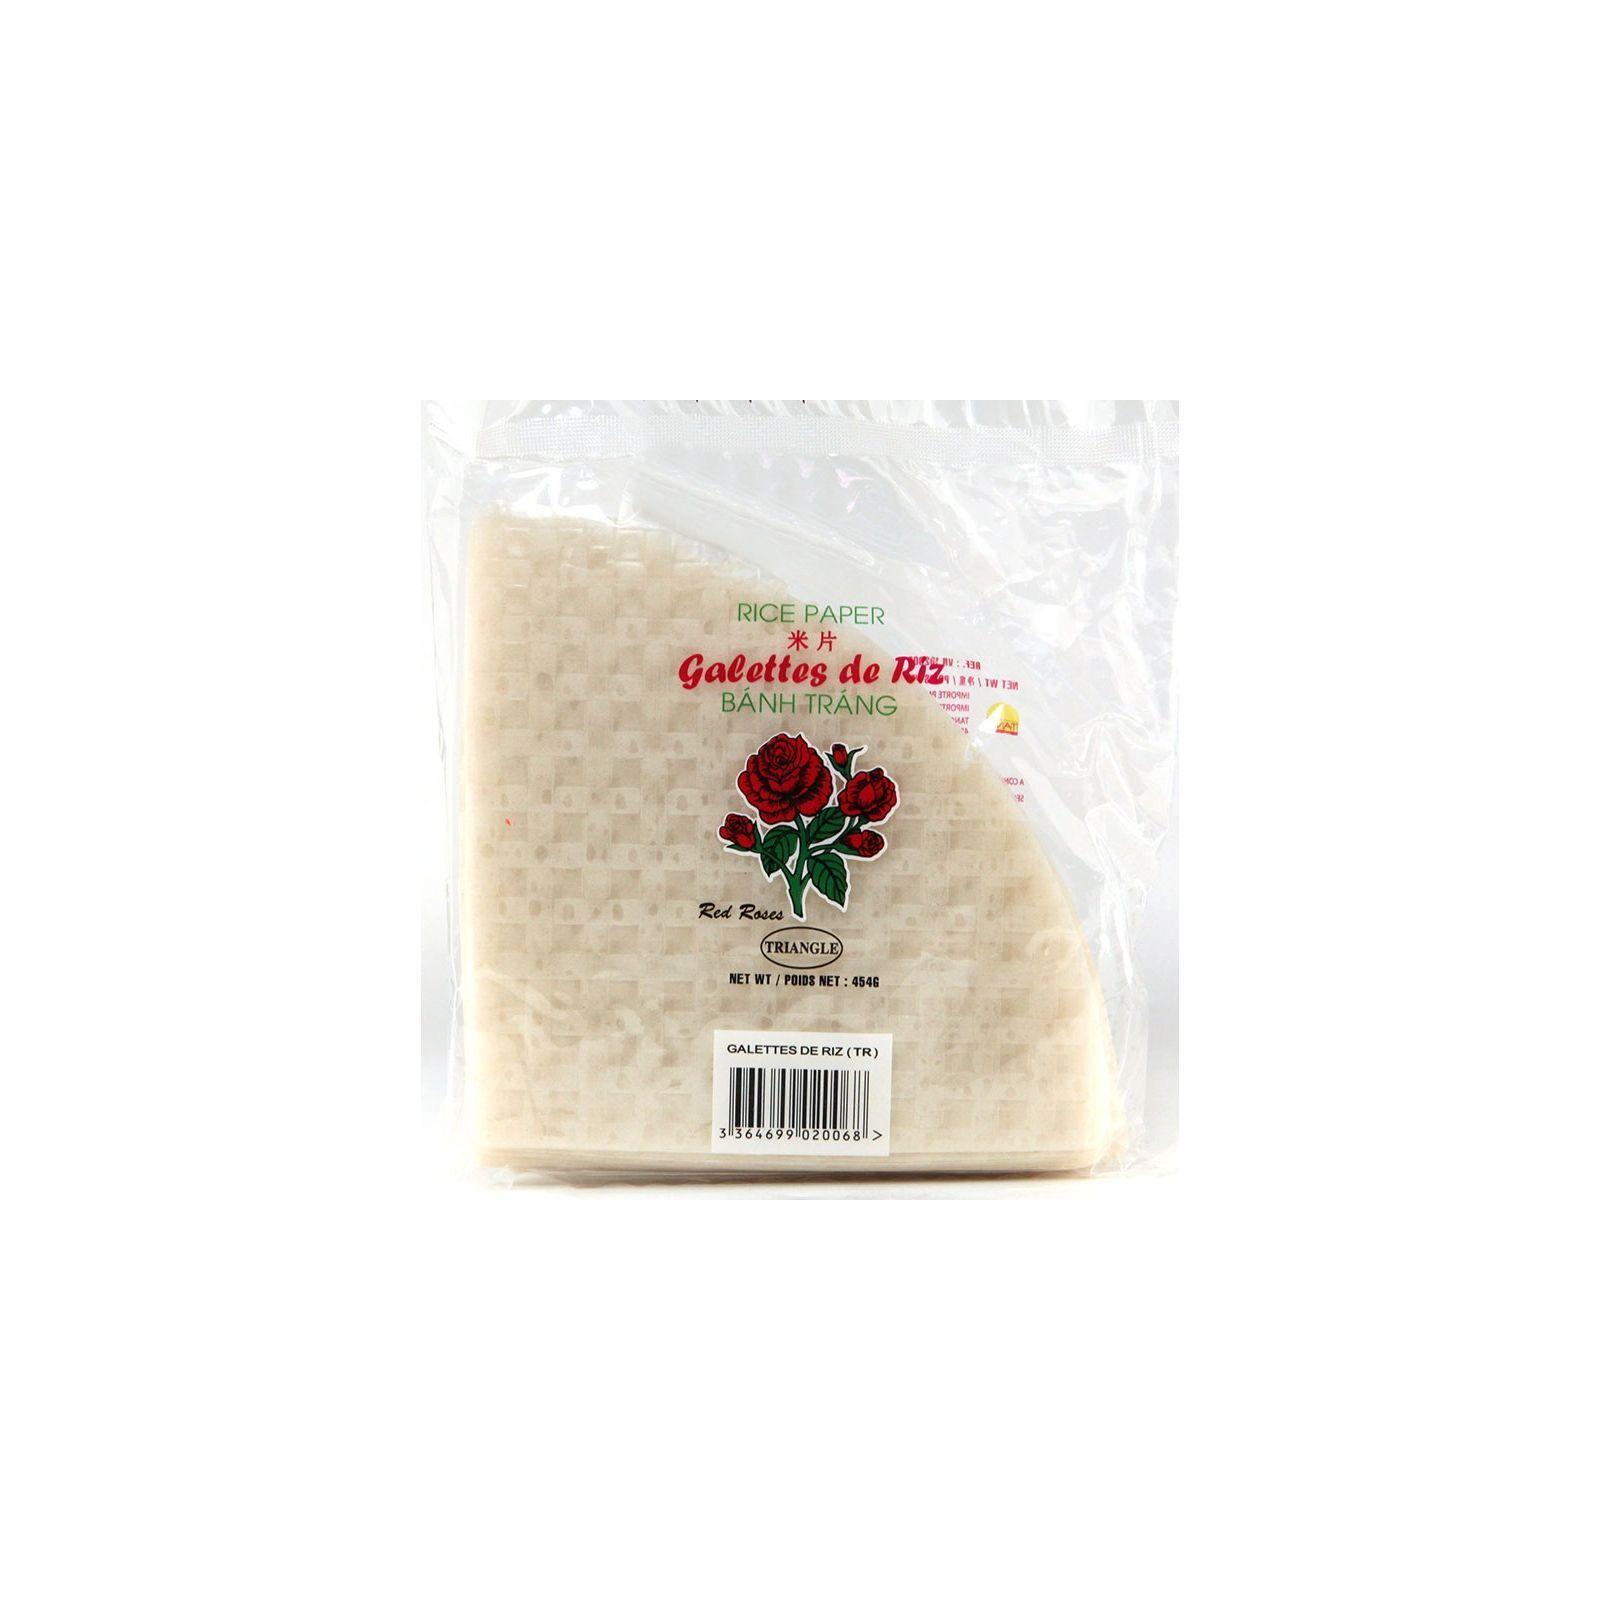 Asia Marché Galettes, Feuilles de riz triangulaire 454g Red Roses